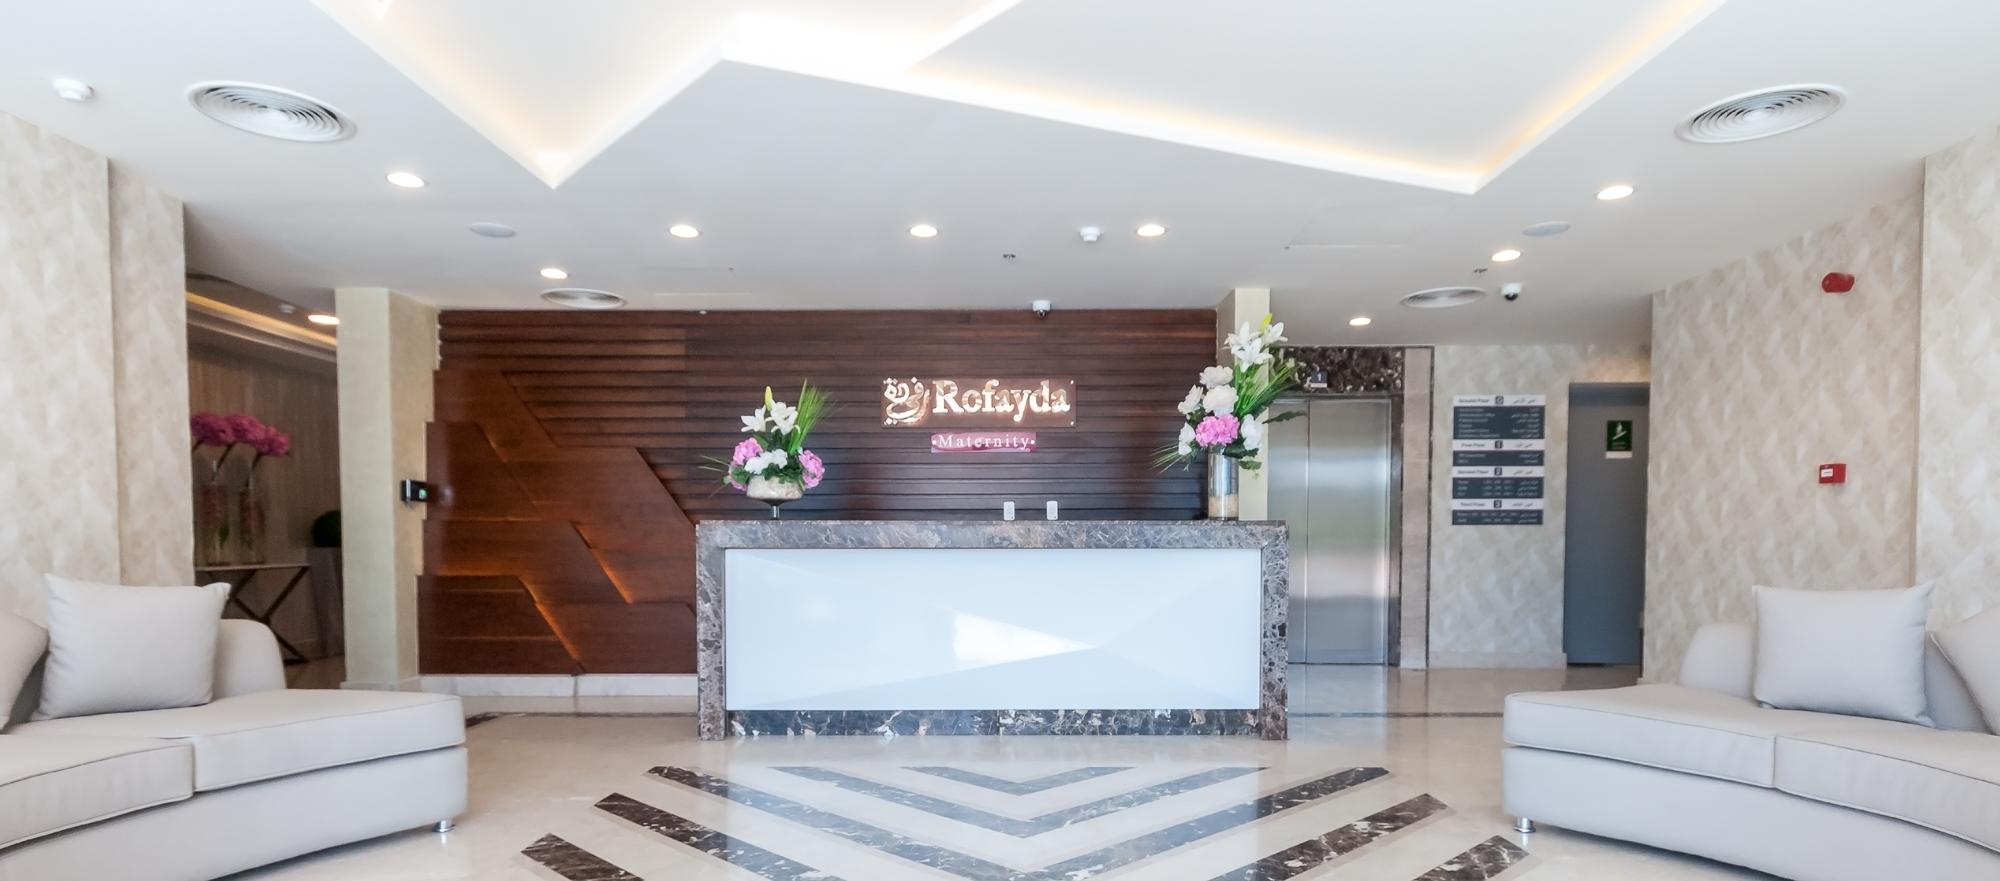 Rofayda Health Park - product 2